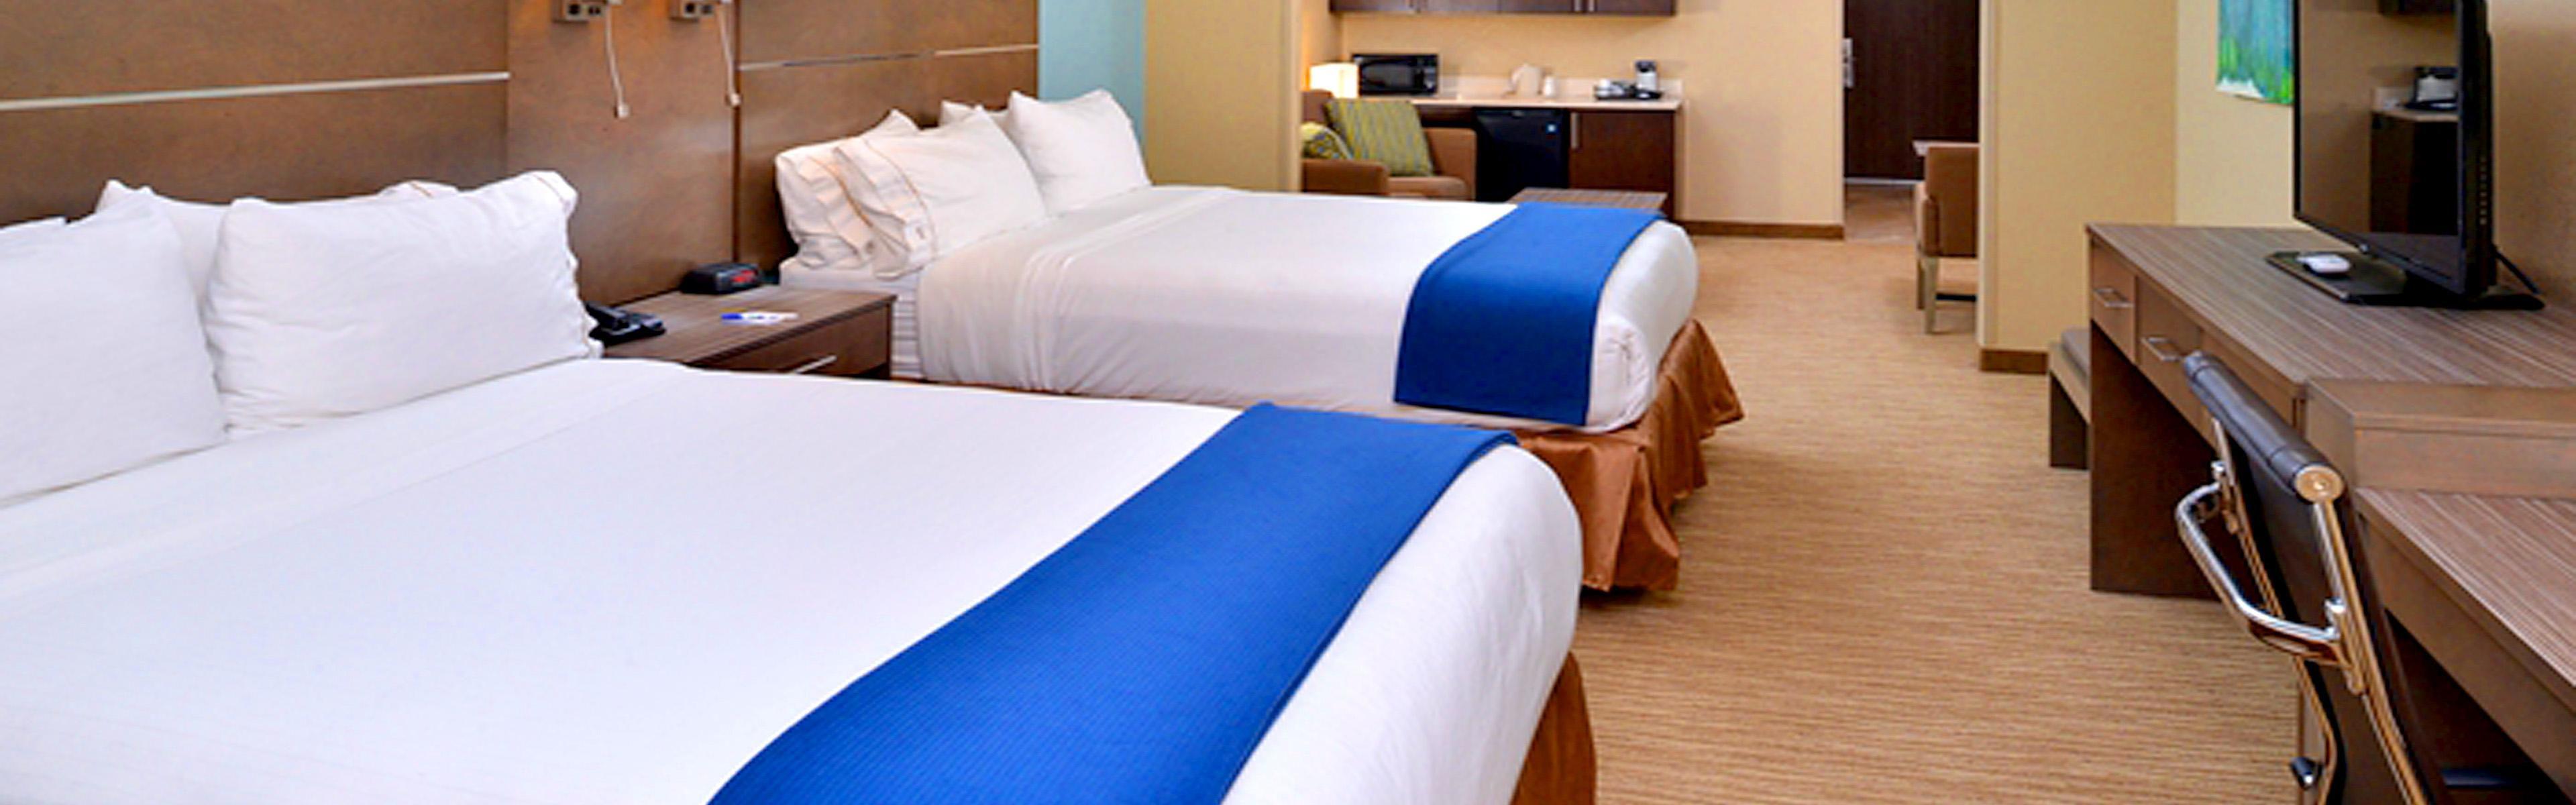 Holiday Inn Express & Suites Schulenburg image 1